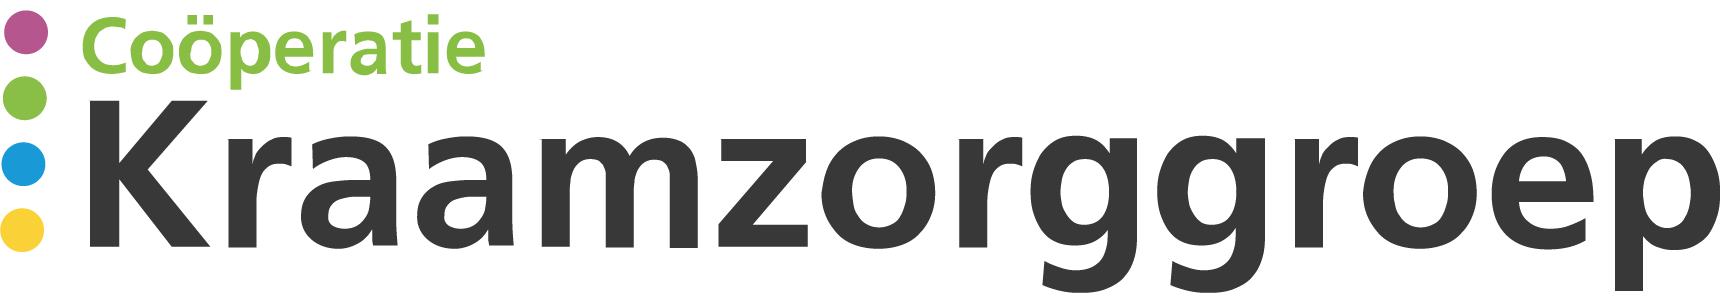 logo kraamzorggroep